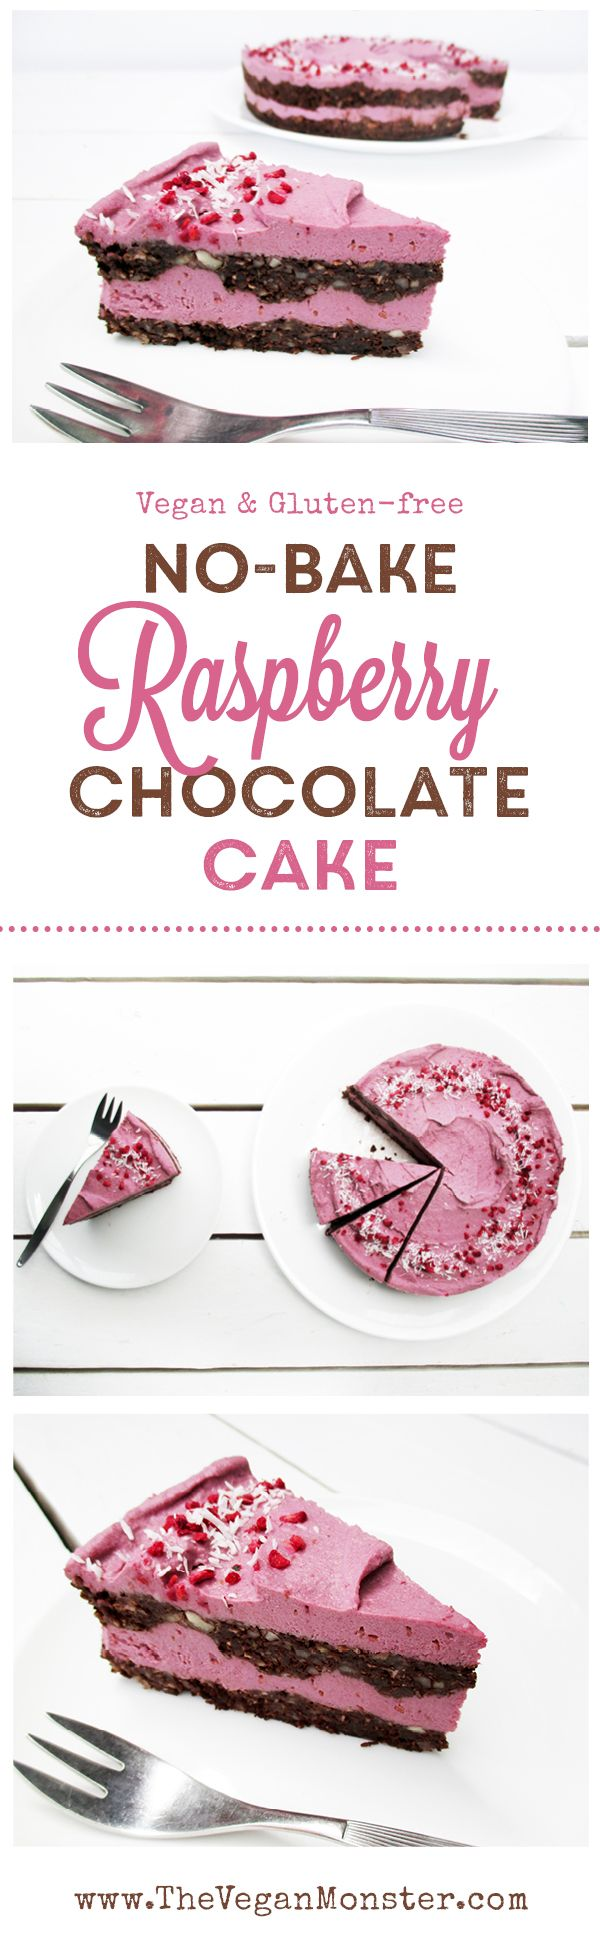 No Bake Chocolate Raspberry Cake. Vegan, Gluten-free, No refined Sugar.